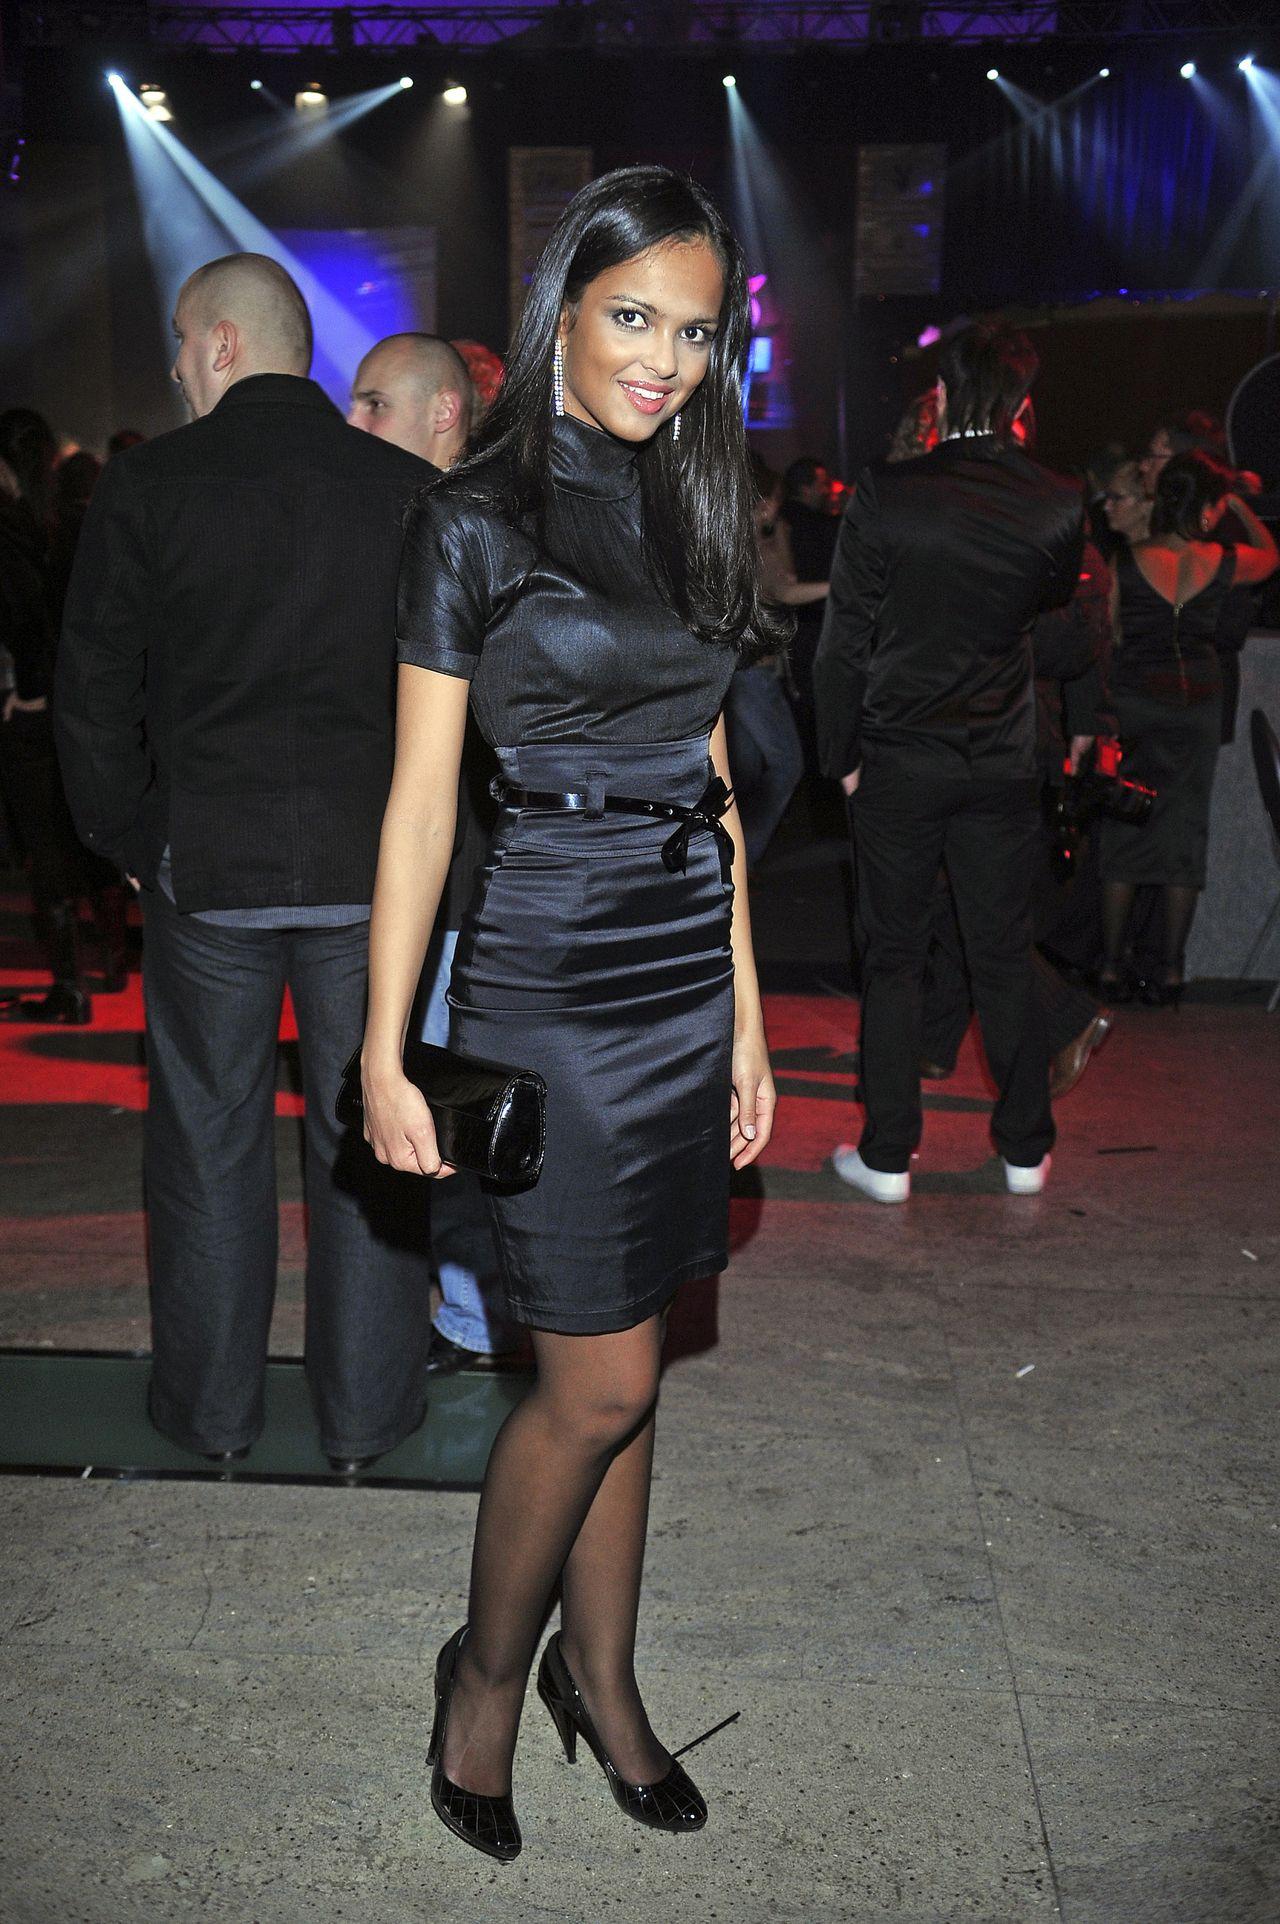 Klaudia El Dursi w czarnej sukience na imprezie